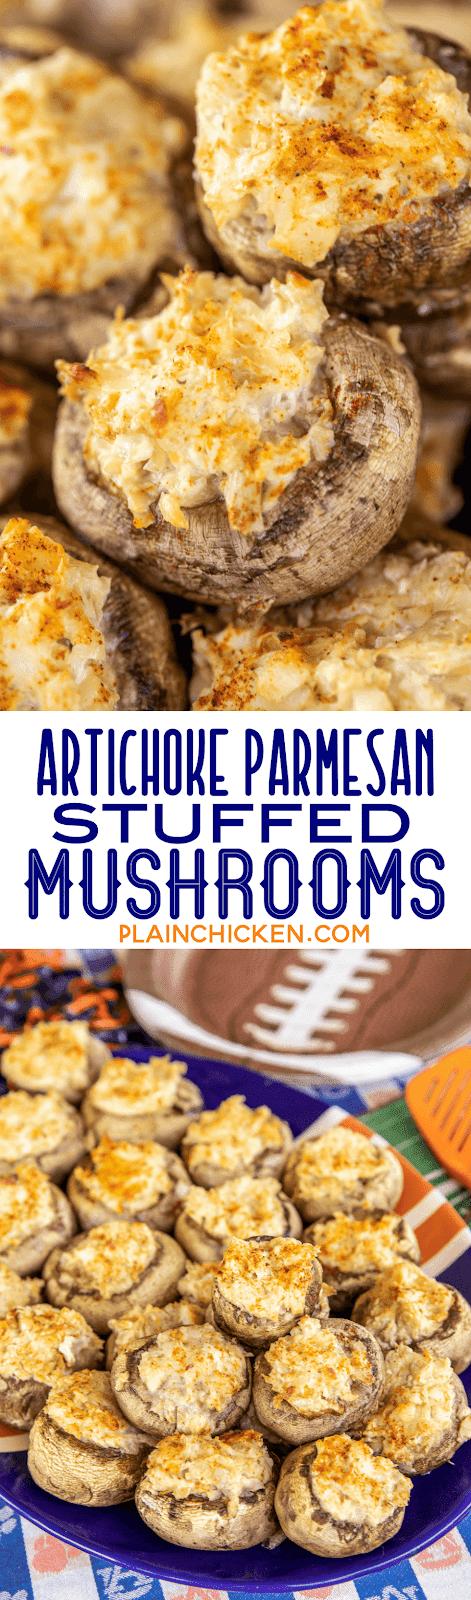 collage of 2 photos of stuffed mushrooms